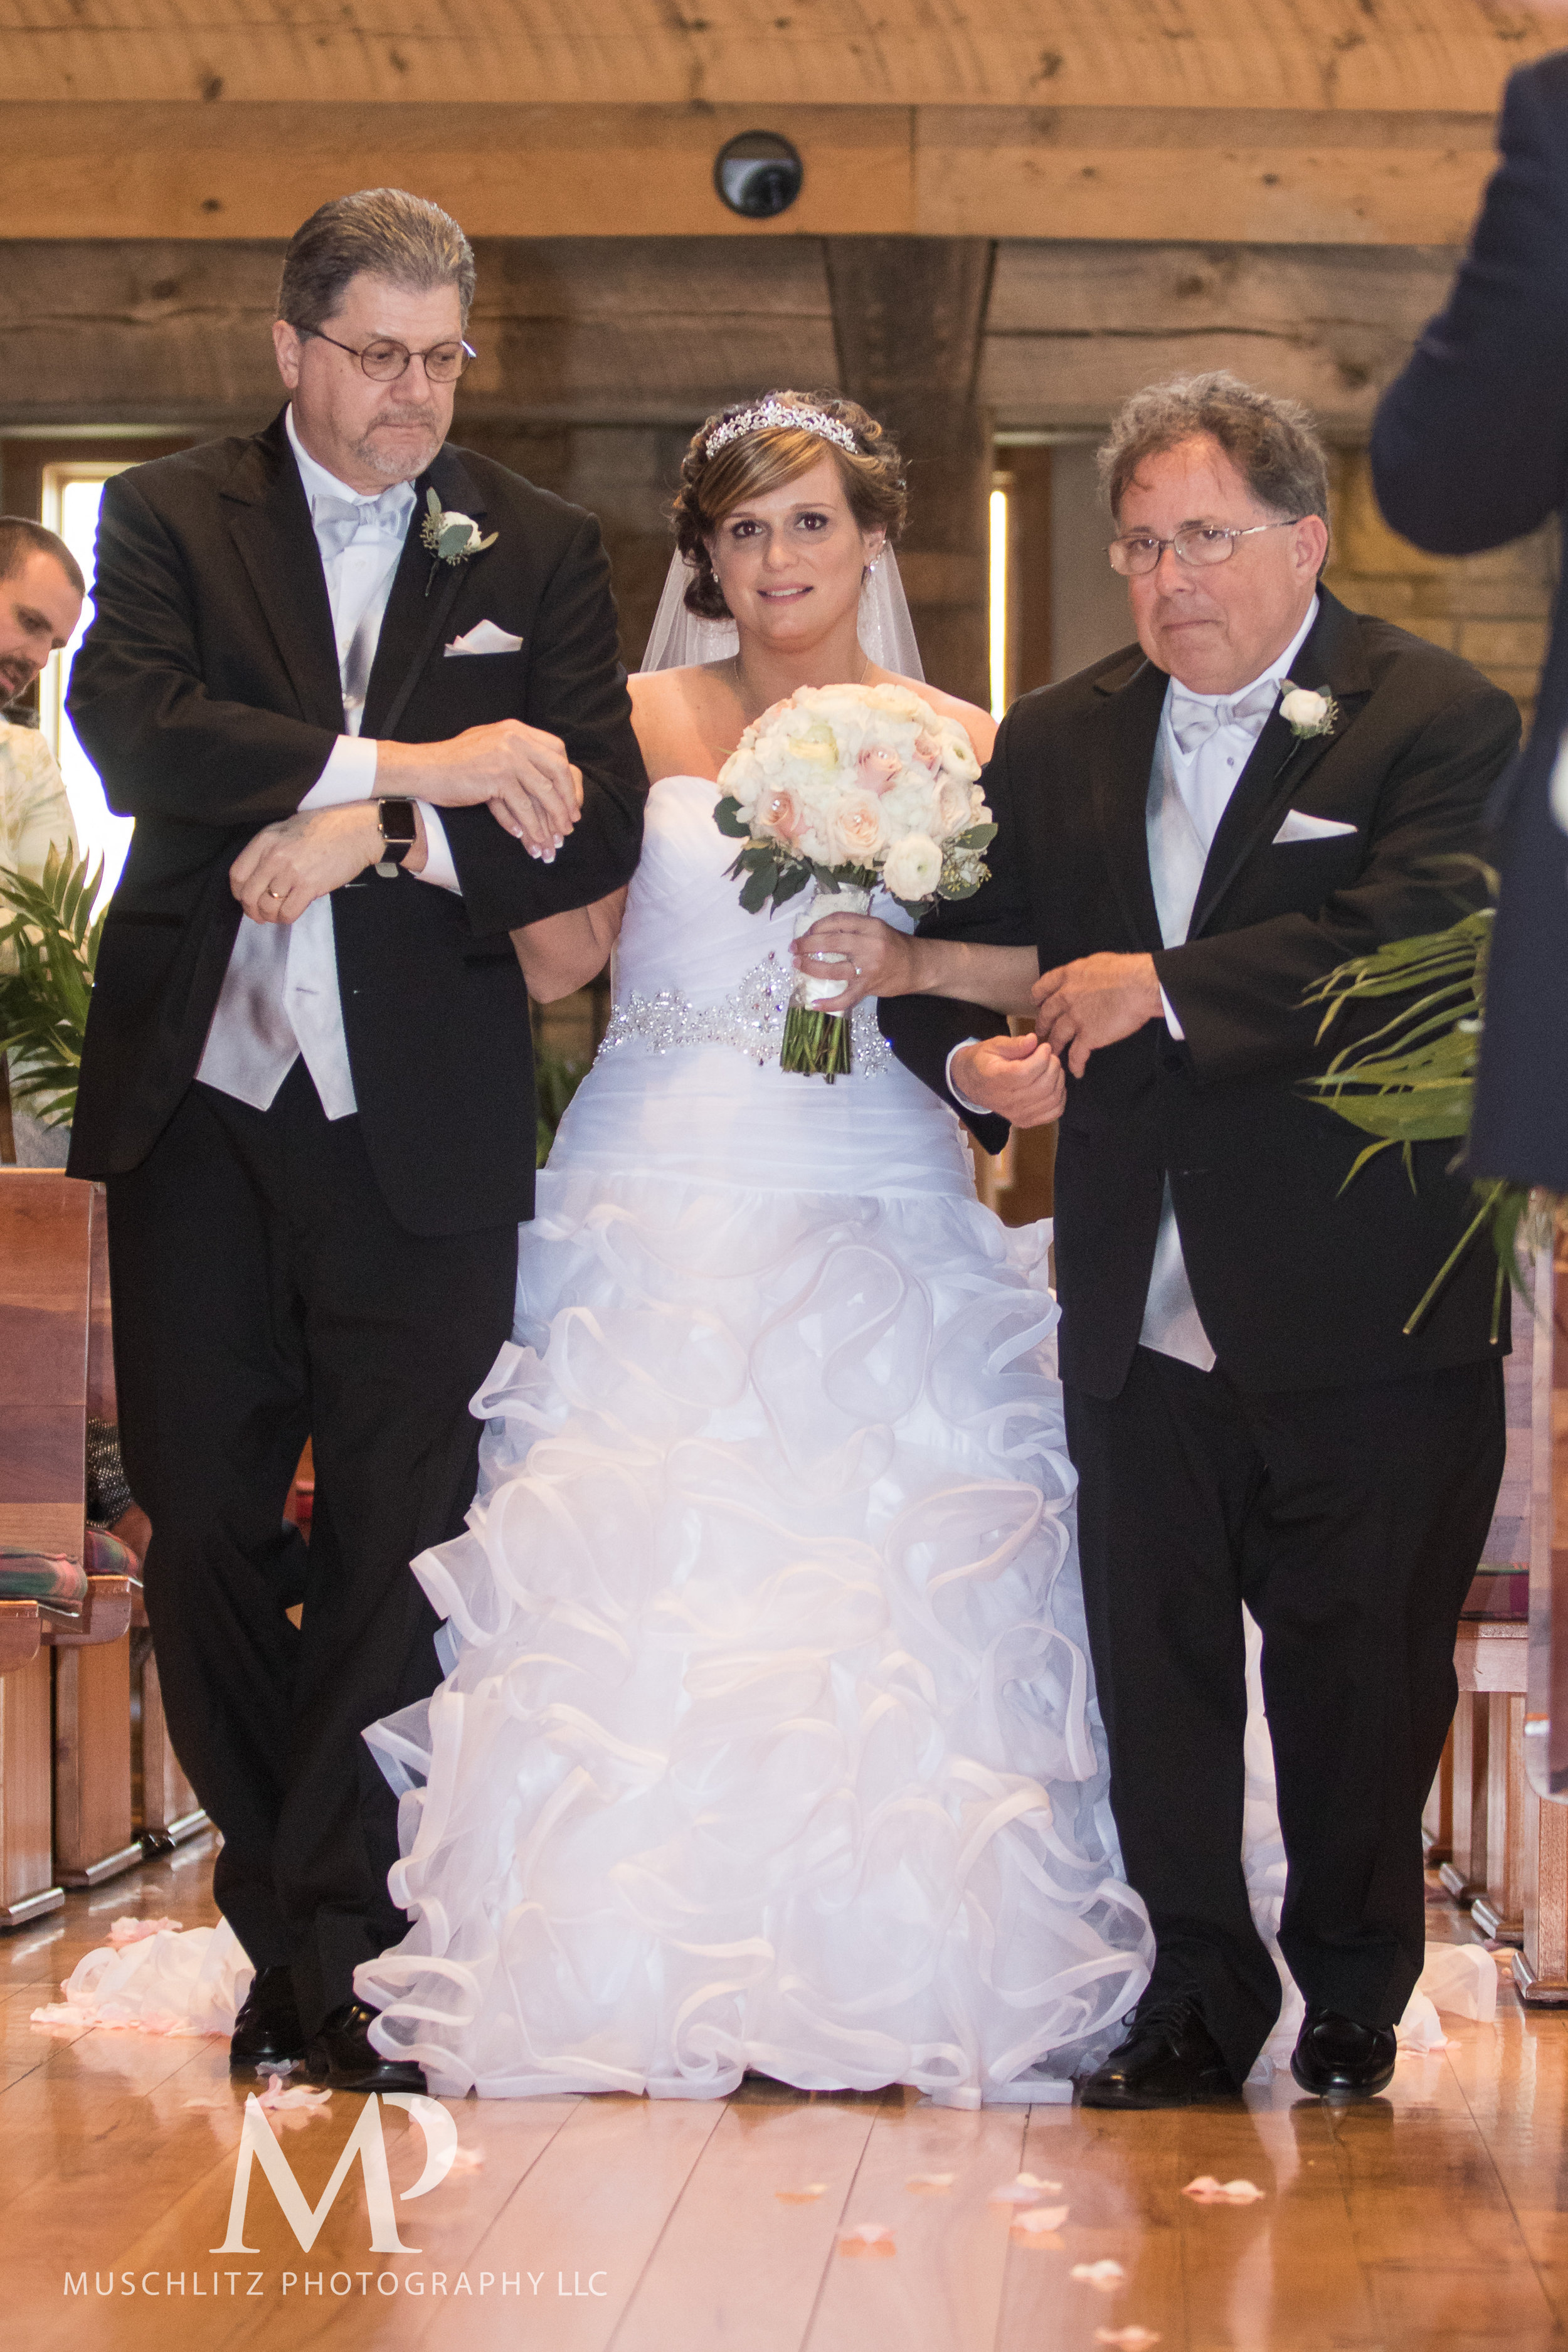 liberty-barn-presbyterian-church-wedding-delaware-columbus-ohio-muschlitz-photography-028.JPG